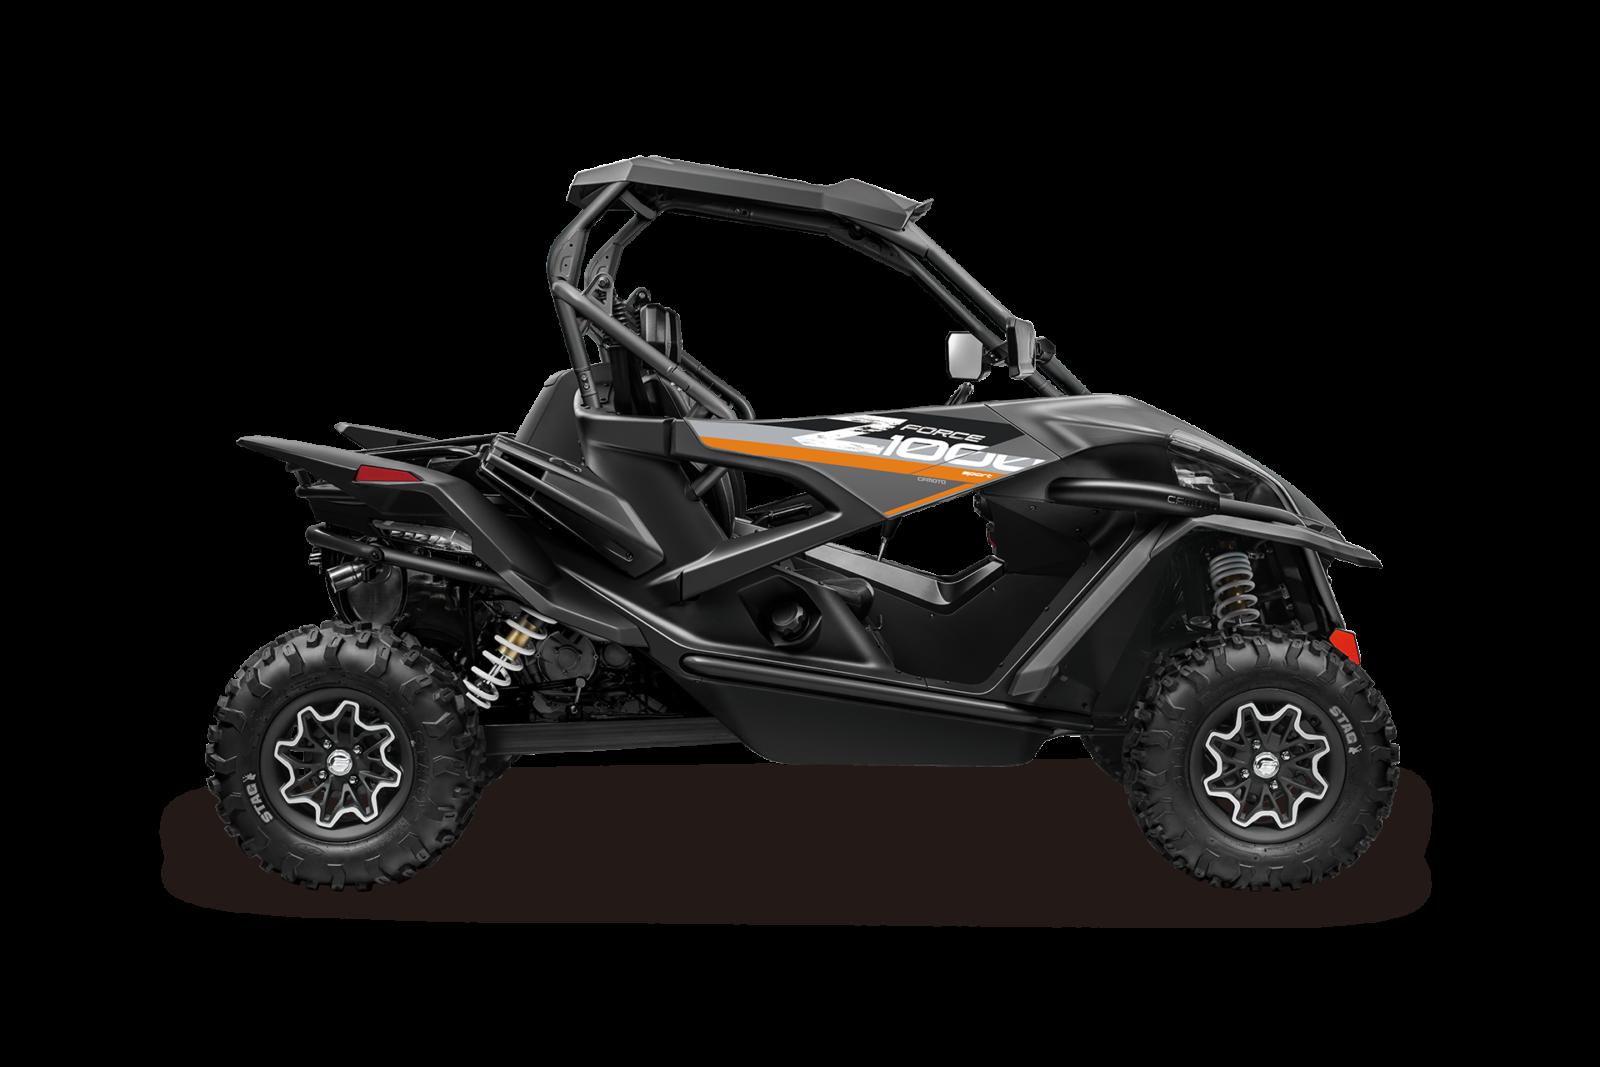 ZFORCE 1000 SPORT grey ATV 01844